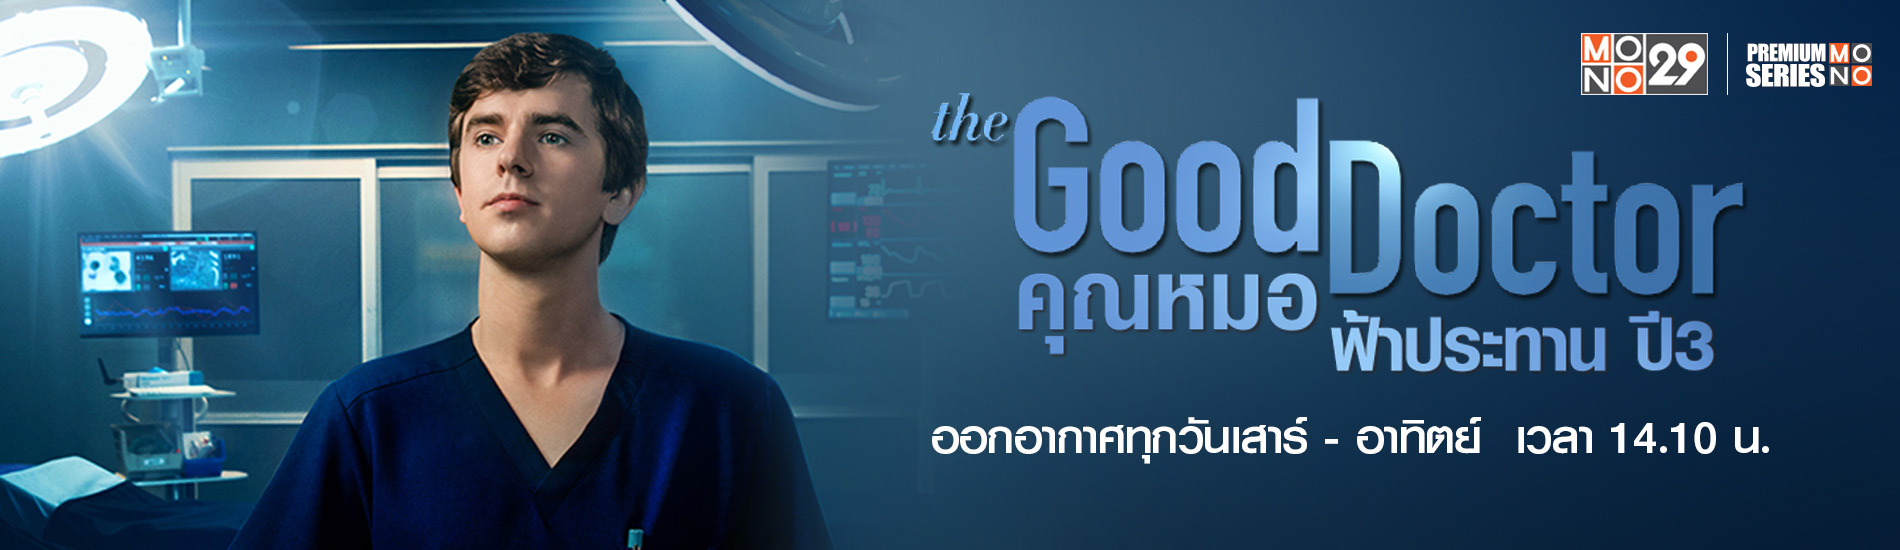 The Good Doctor คุณหมอฟ้าประทาน ปี 3